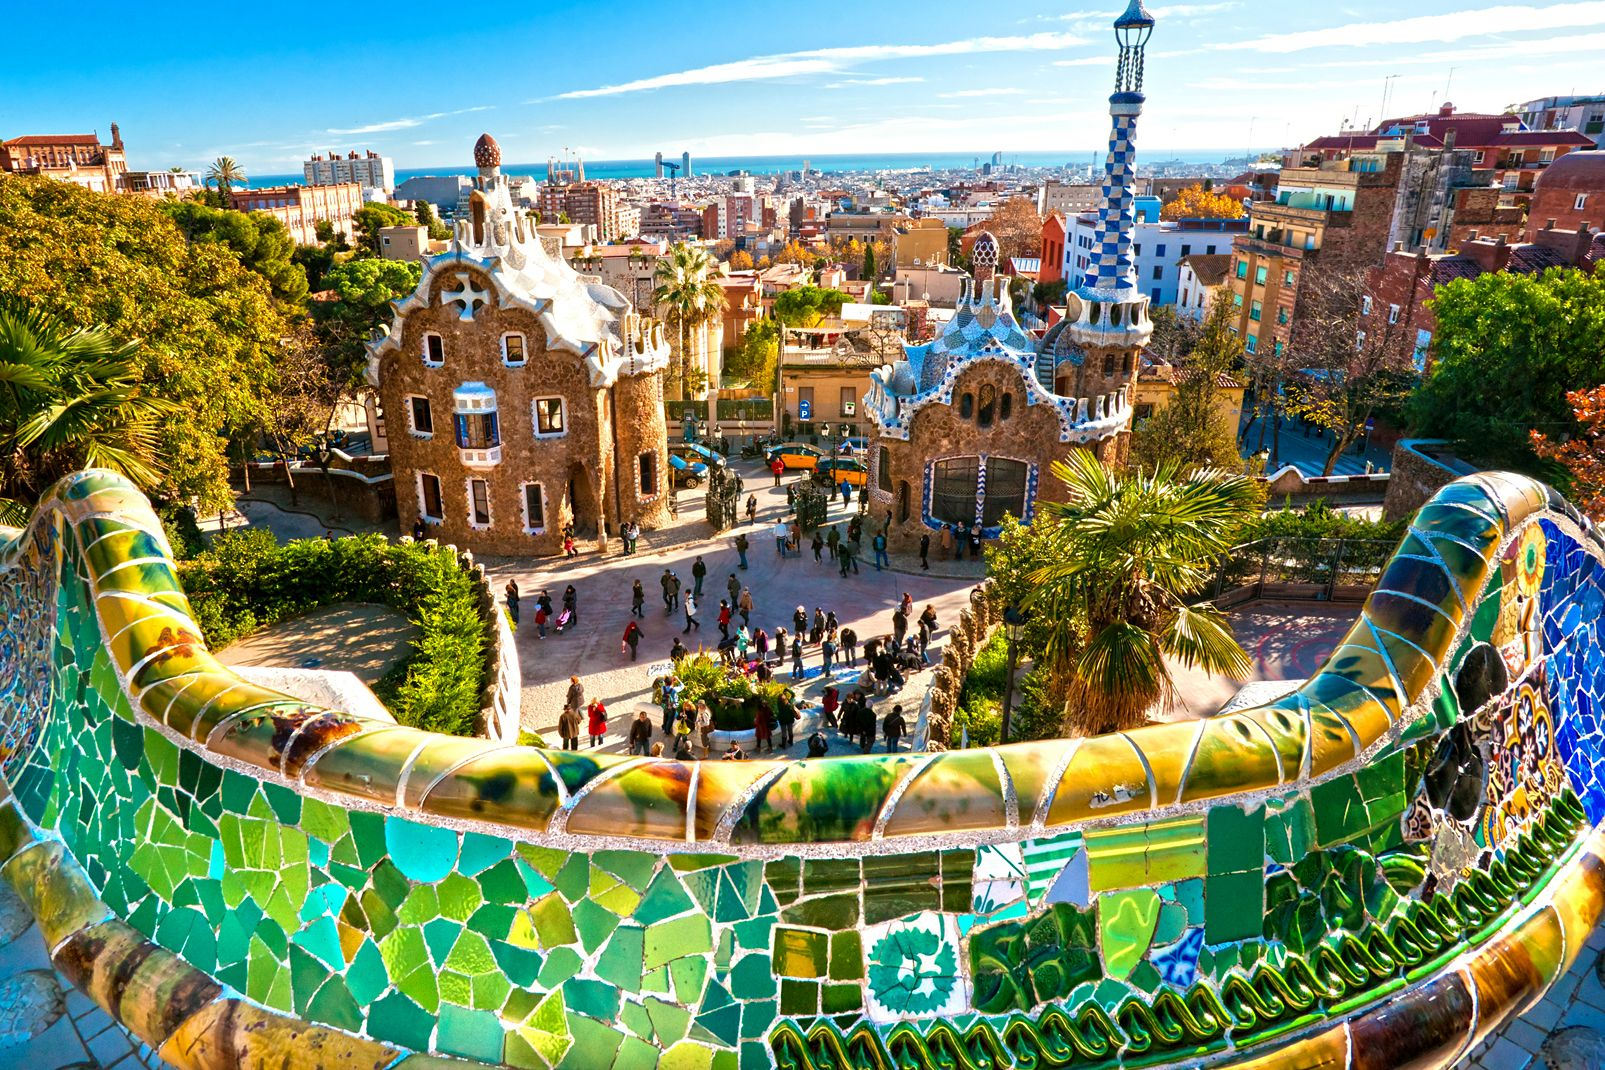 Europe, Espagne, art, gaudi, Barcelone, guell, parc